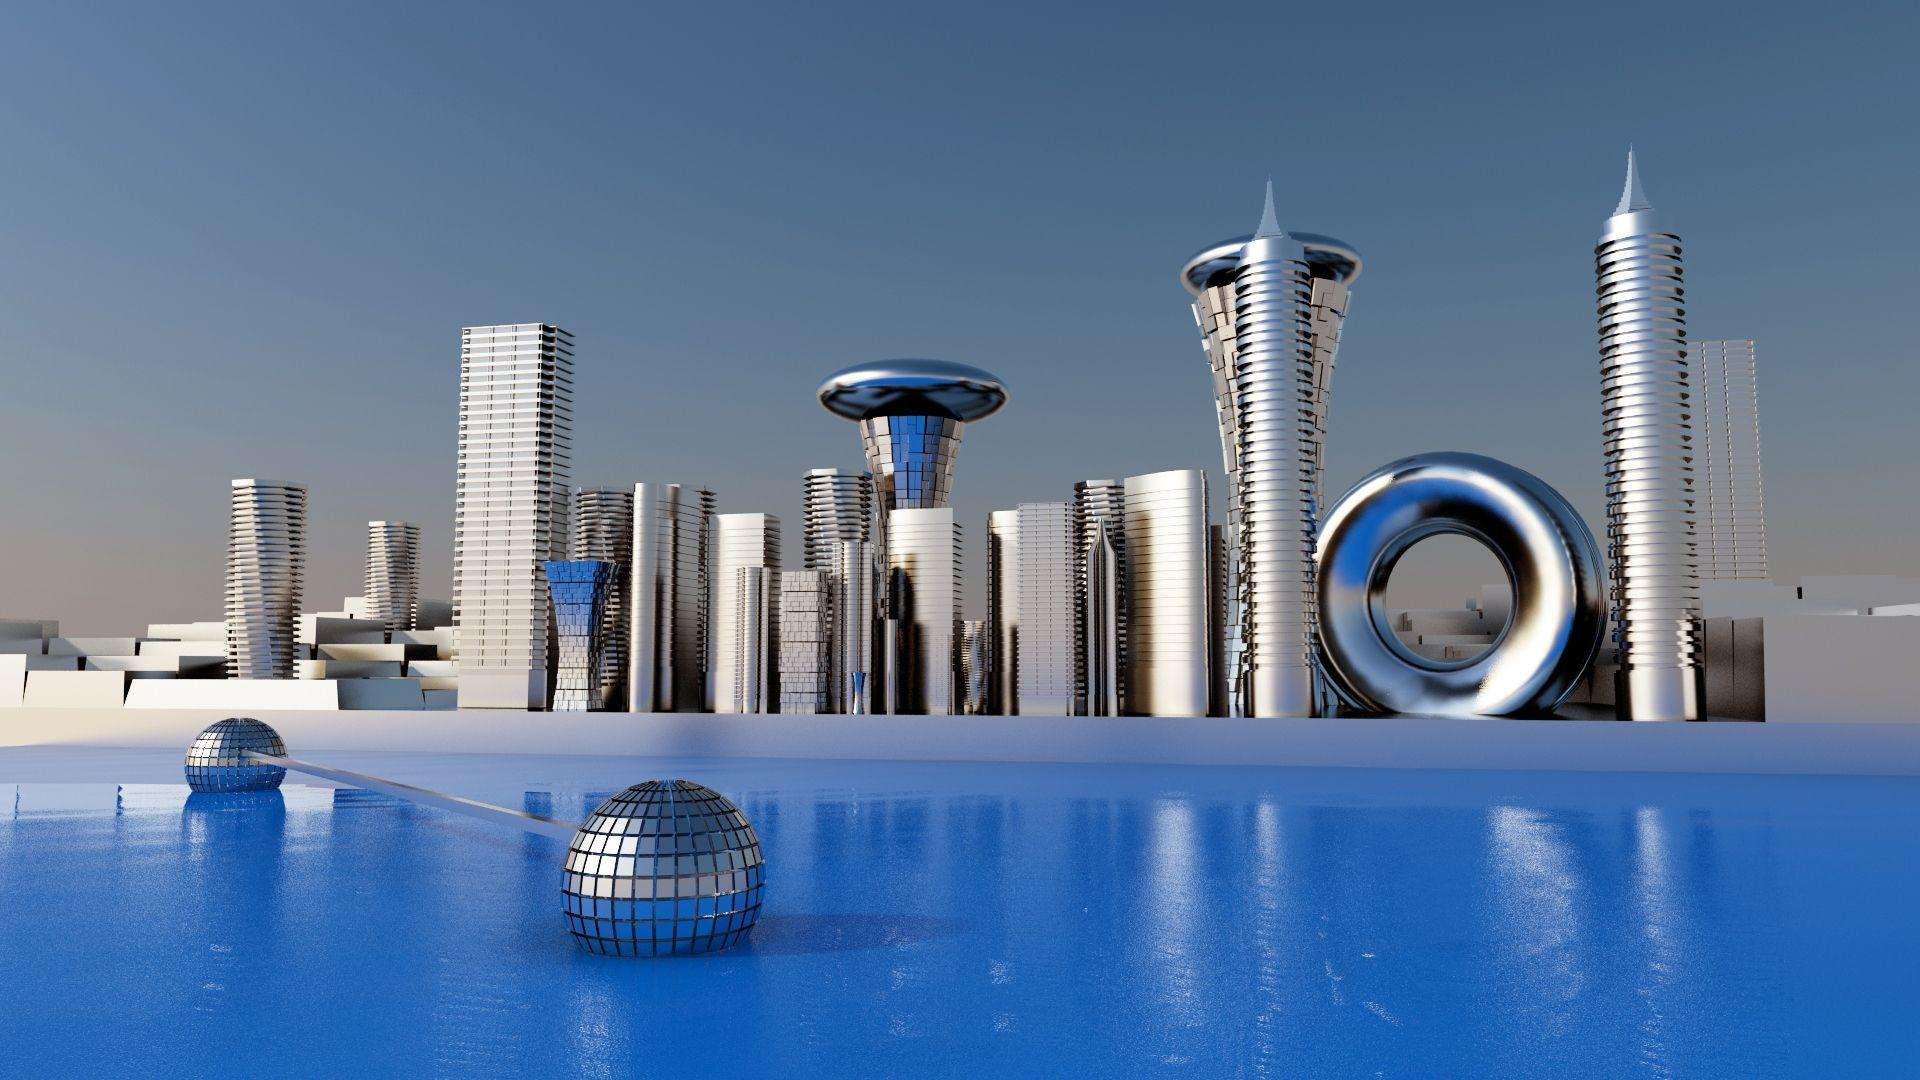 future cityscape_4b100fe076a92_hires.jpg (JPEG Image, 1920 × 1080 pixels) -  Scaled (68%) | Future wallpaper, Future buildings, Cityscape